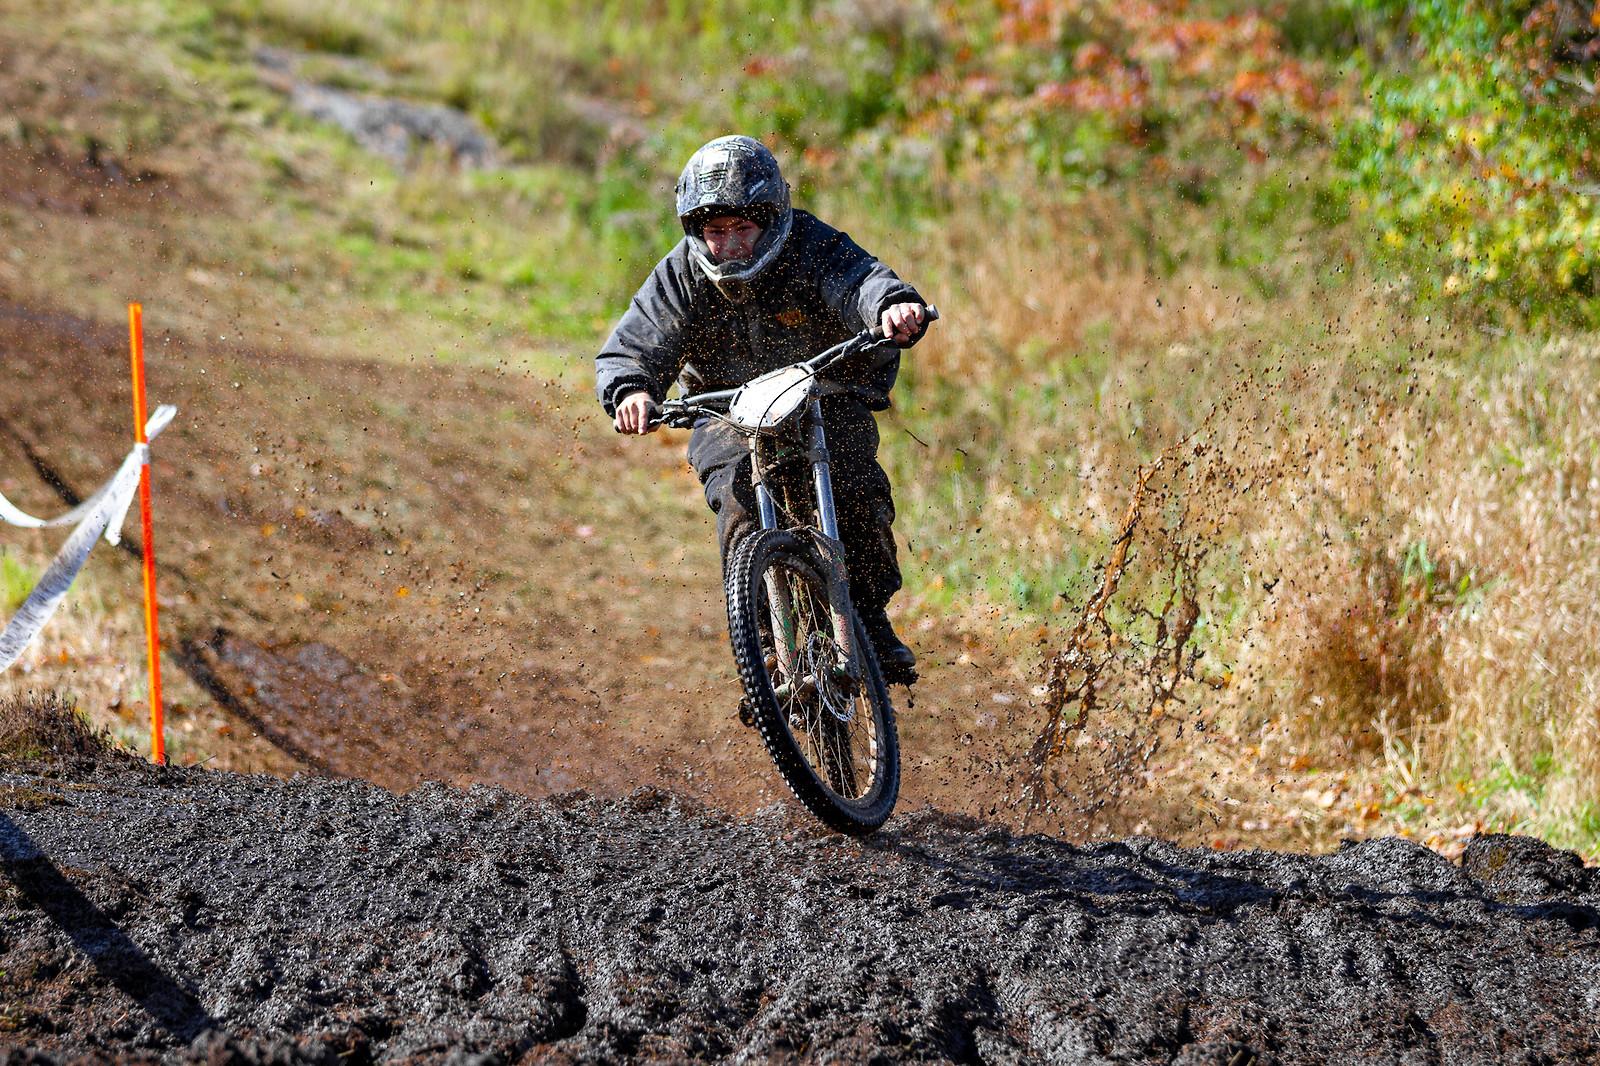 Connor Garber - JackRice - Mountain Biking Pictures - Vital MTB